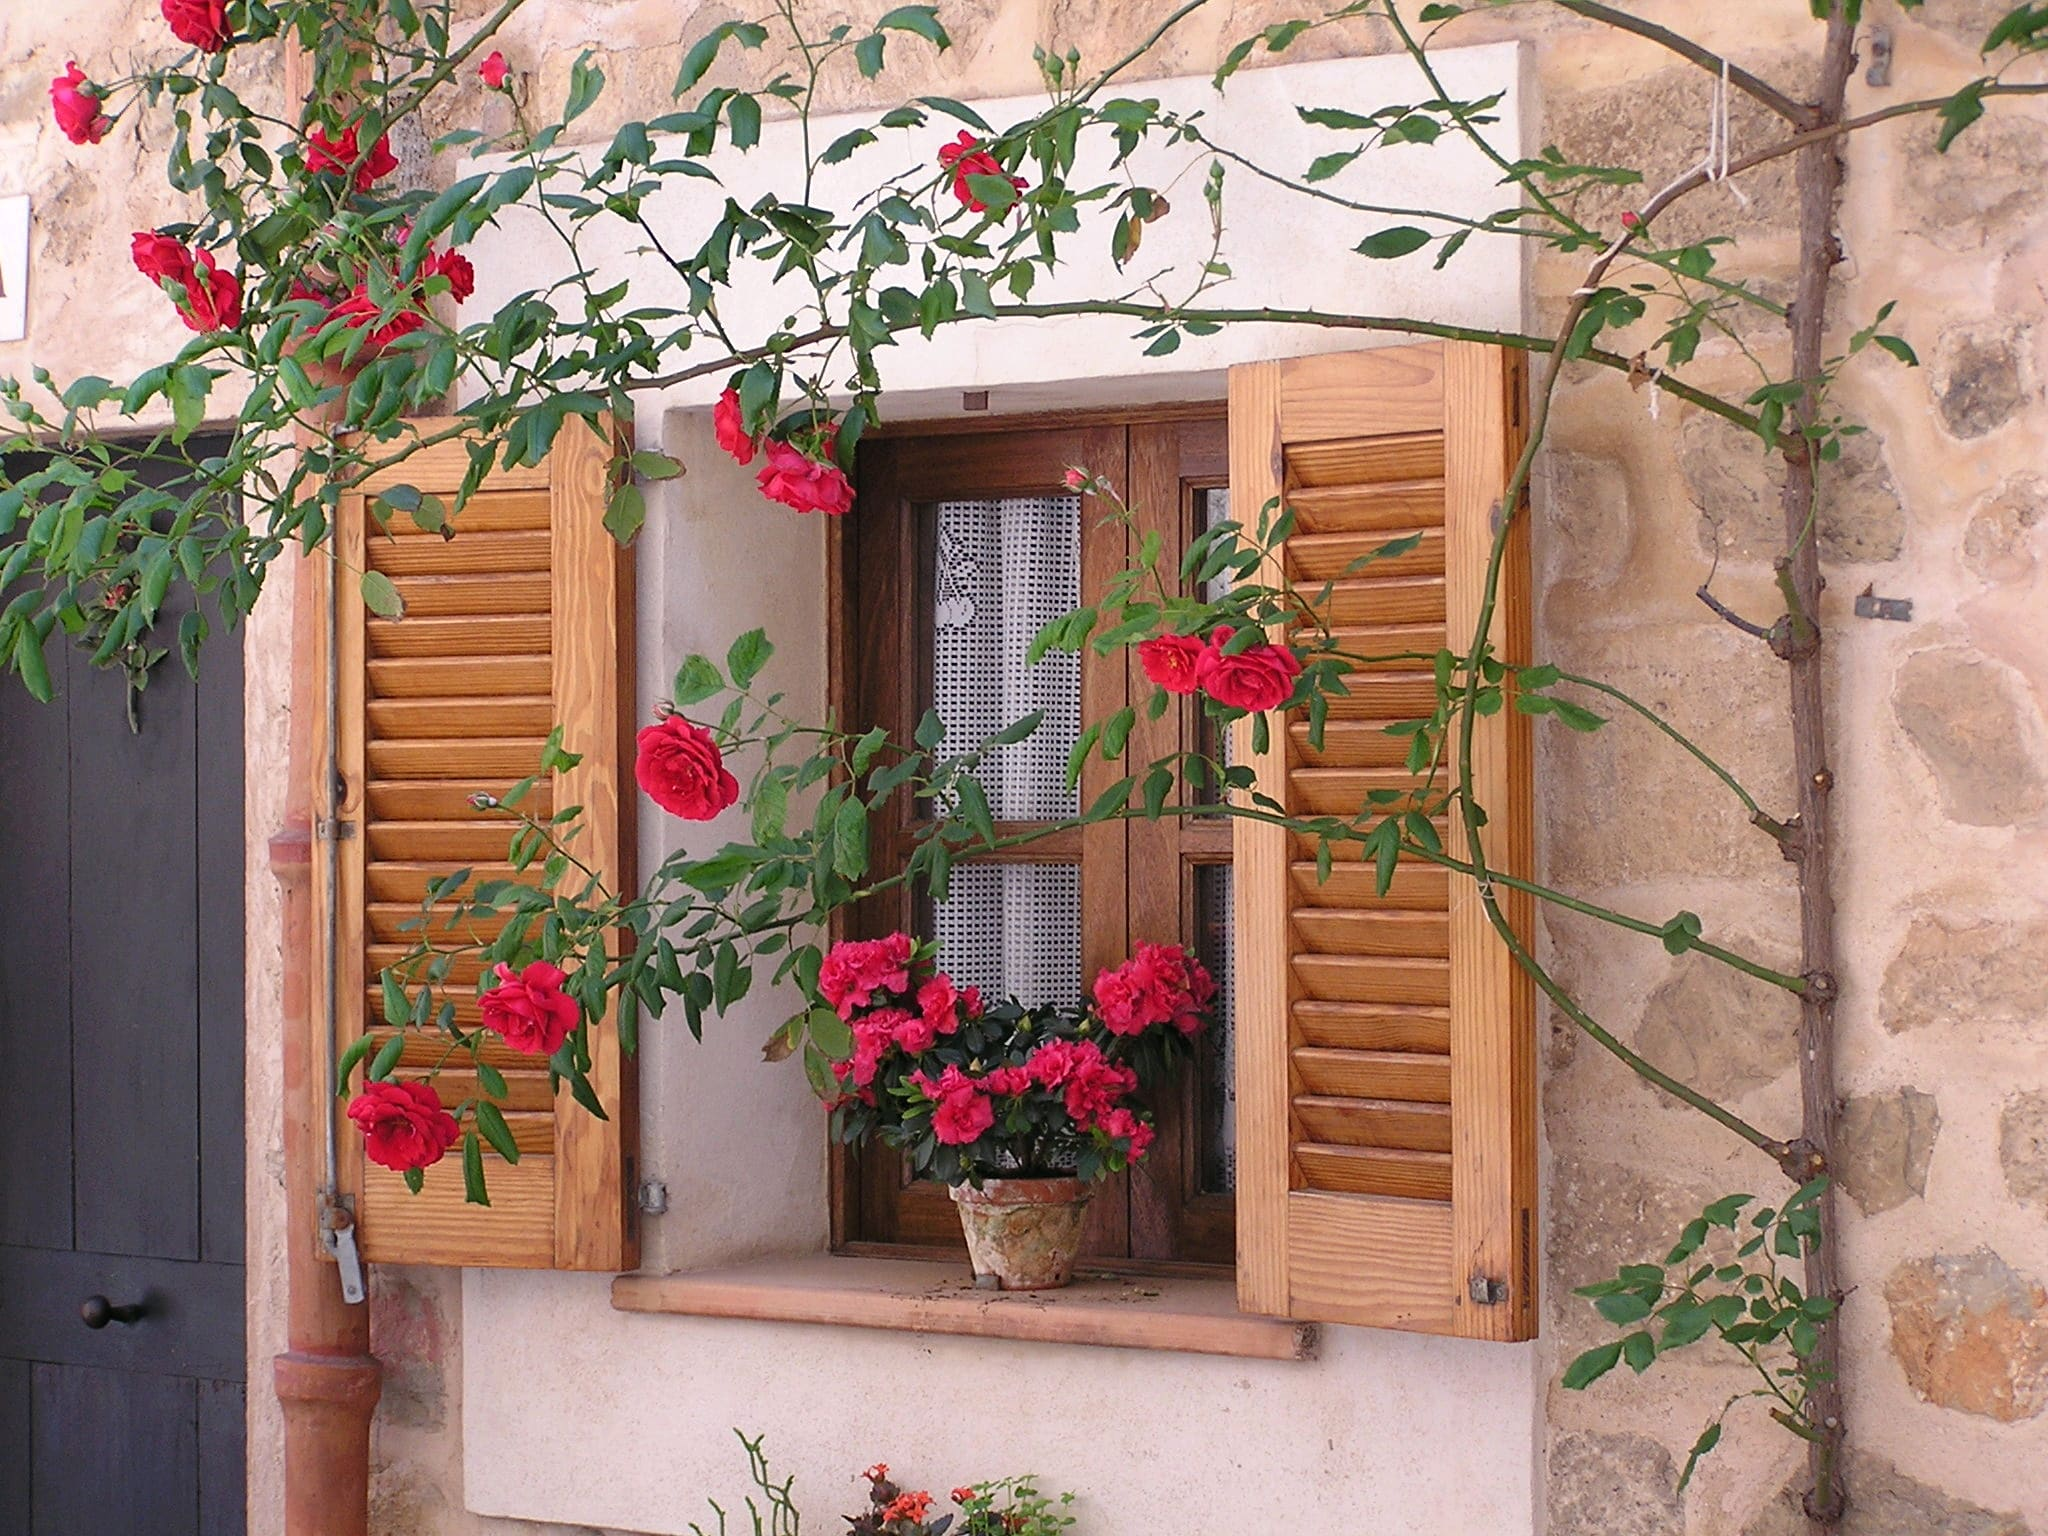 Holzfenster mit Blumentopf